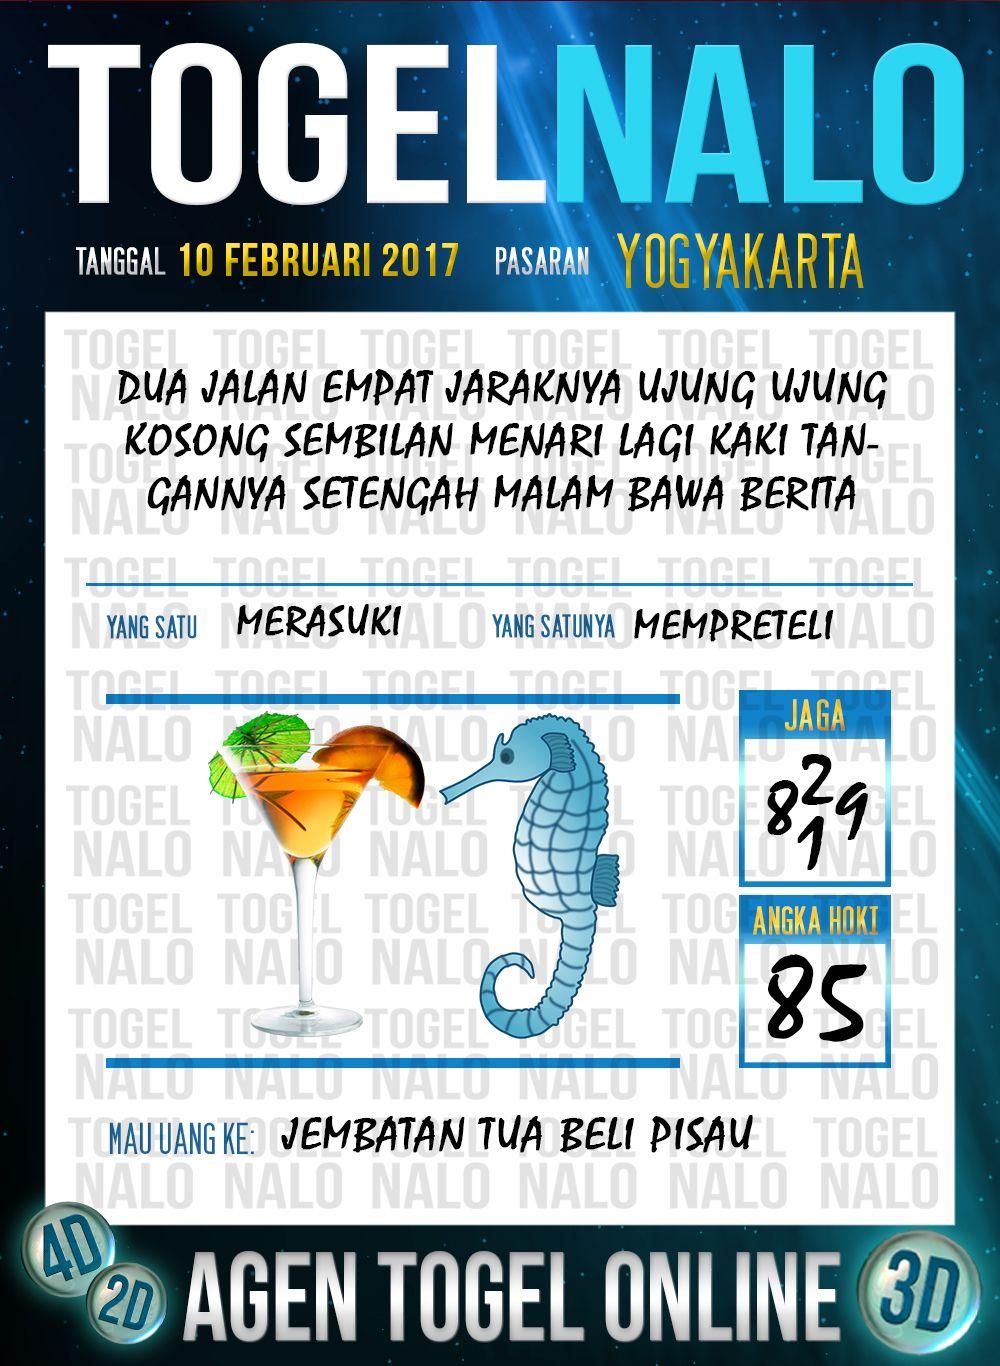 Acak Kodal 3d Togel Wap Online Live Draw 4d Togelnalo Yogyakarta 10 Febuari 2017 Desember 10 Februari November